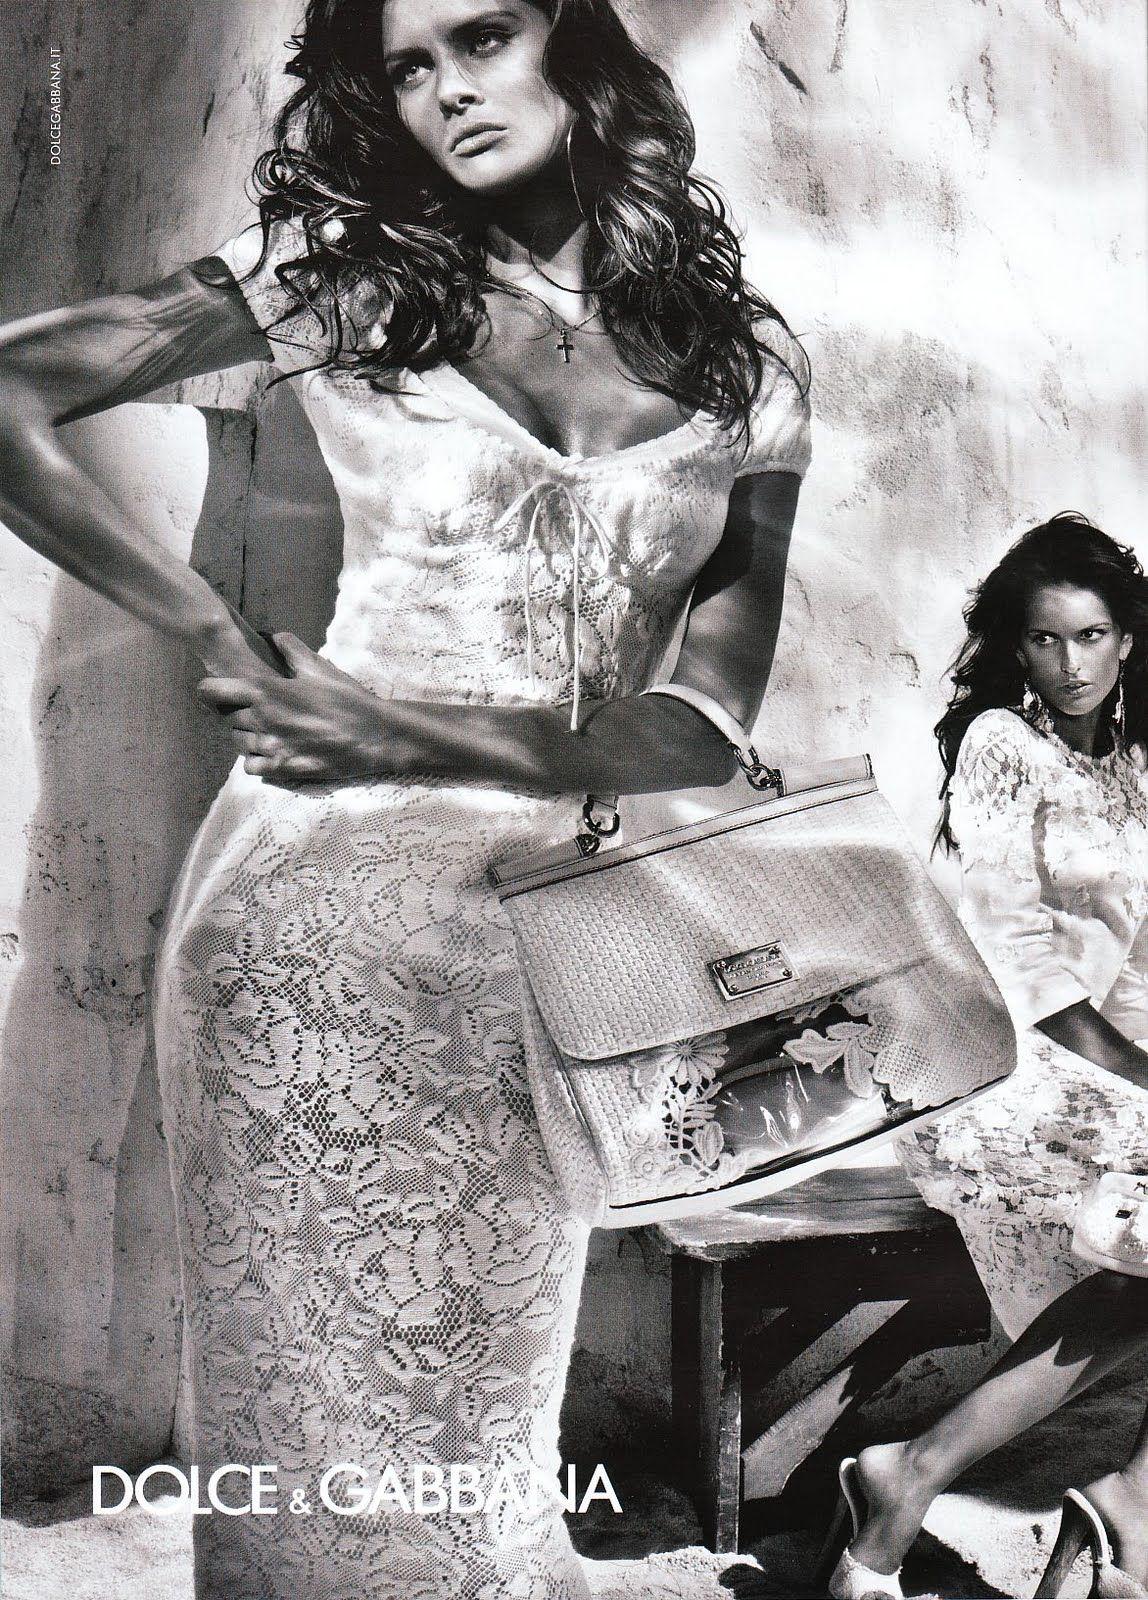 Dolce+%26+Gabbana+Spring+2011+campaign+photo+Steven+Klein+Women+Management+New+York+City+Blog+Izabel+Goulart+3.jpg 1148×1600 pixels